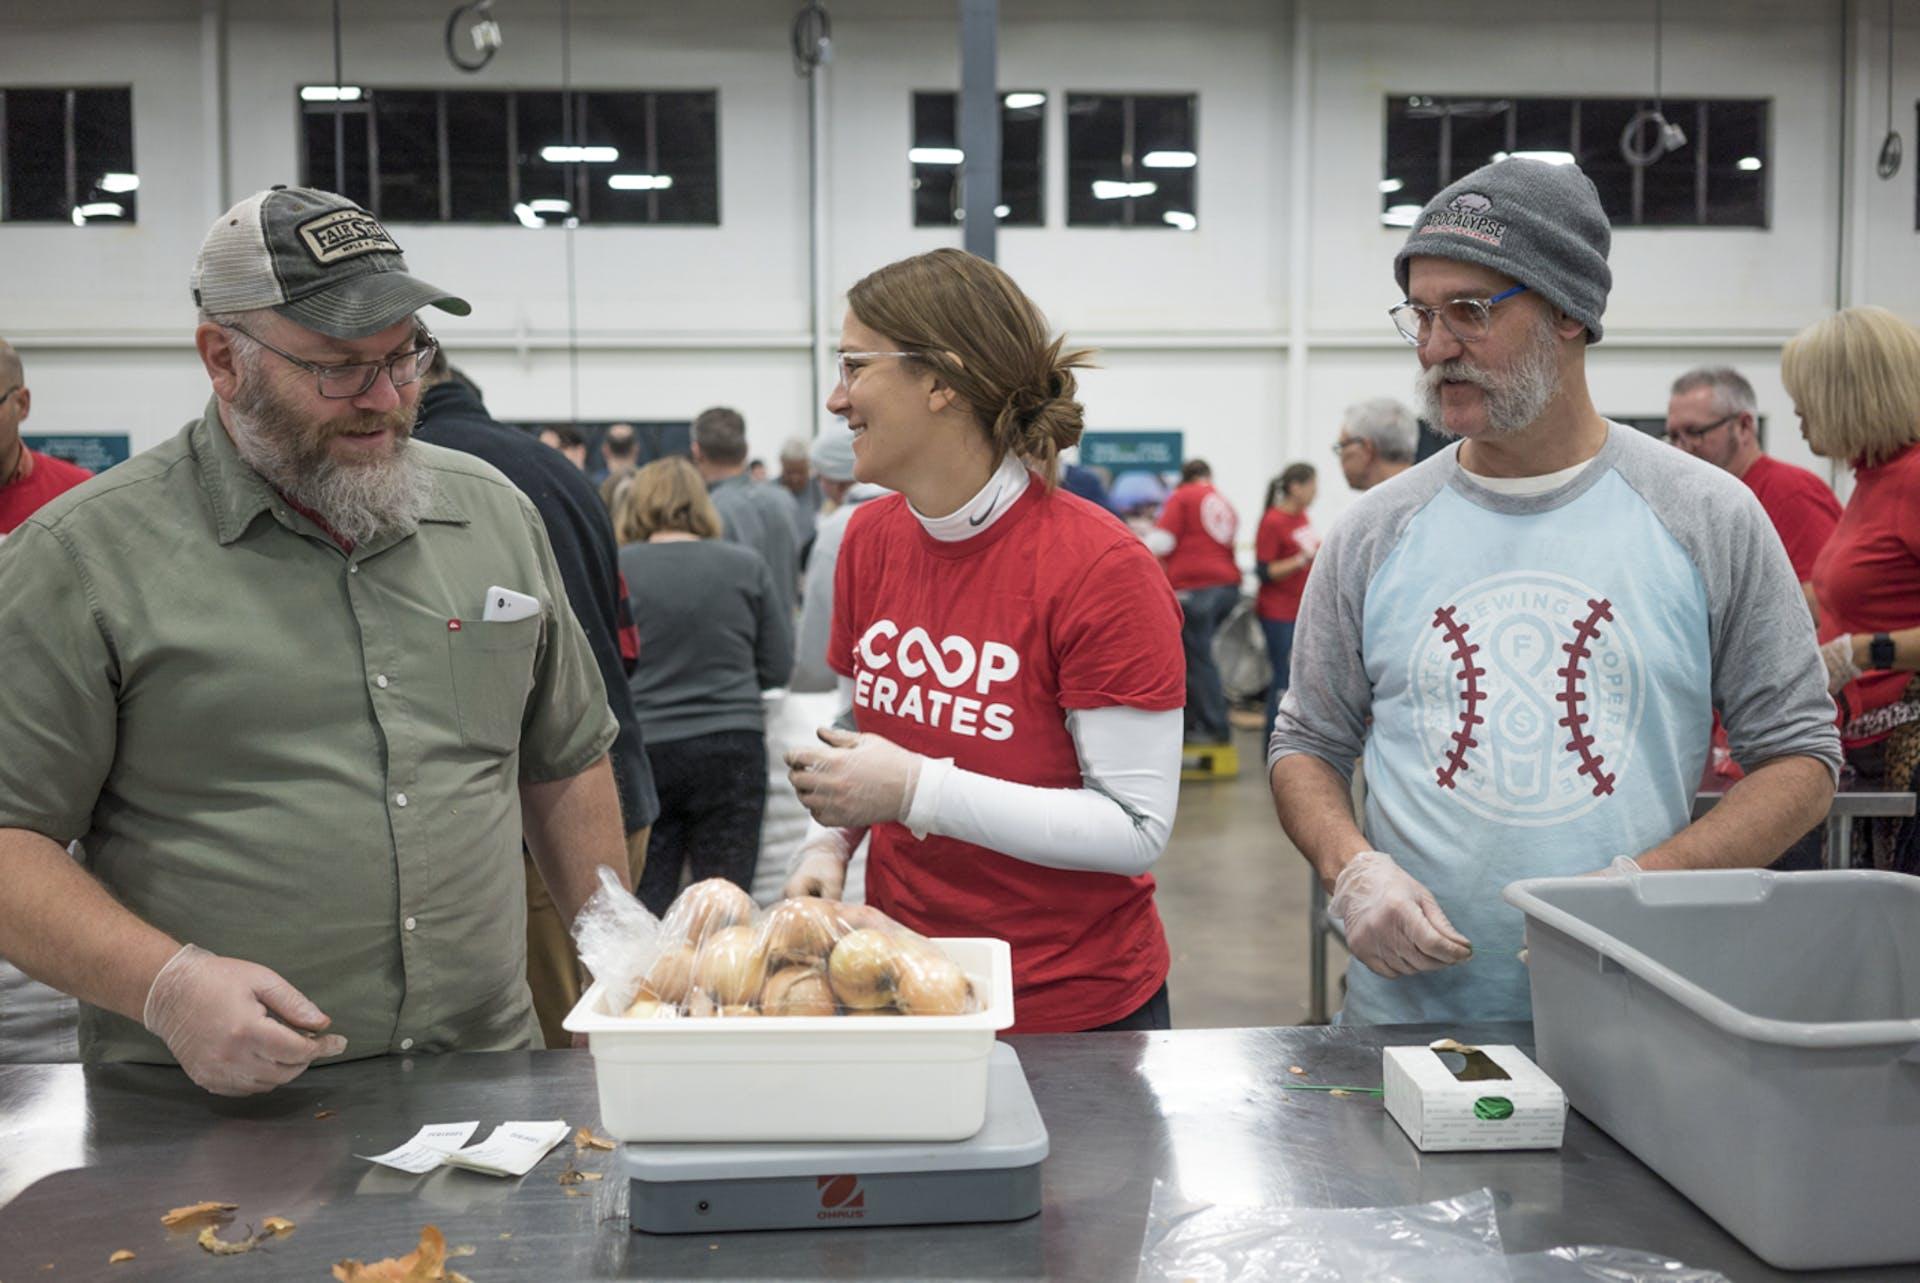 Cooperates_foodpacking_2_FAIRSTATE_